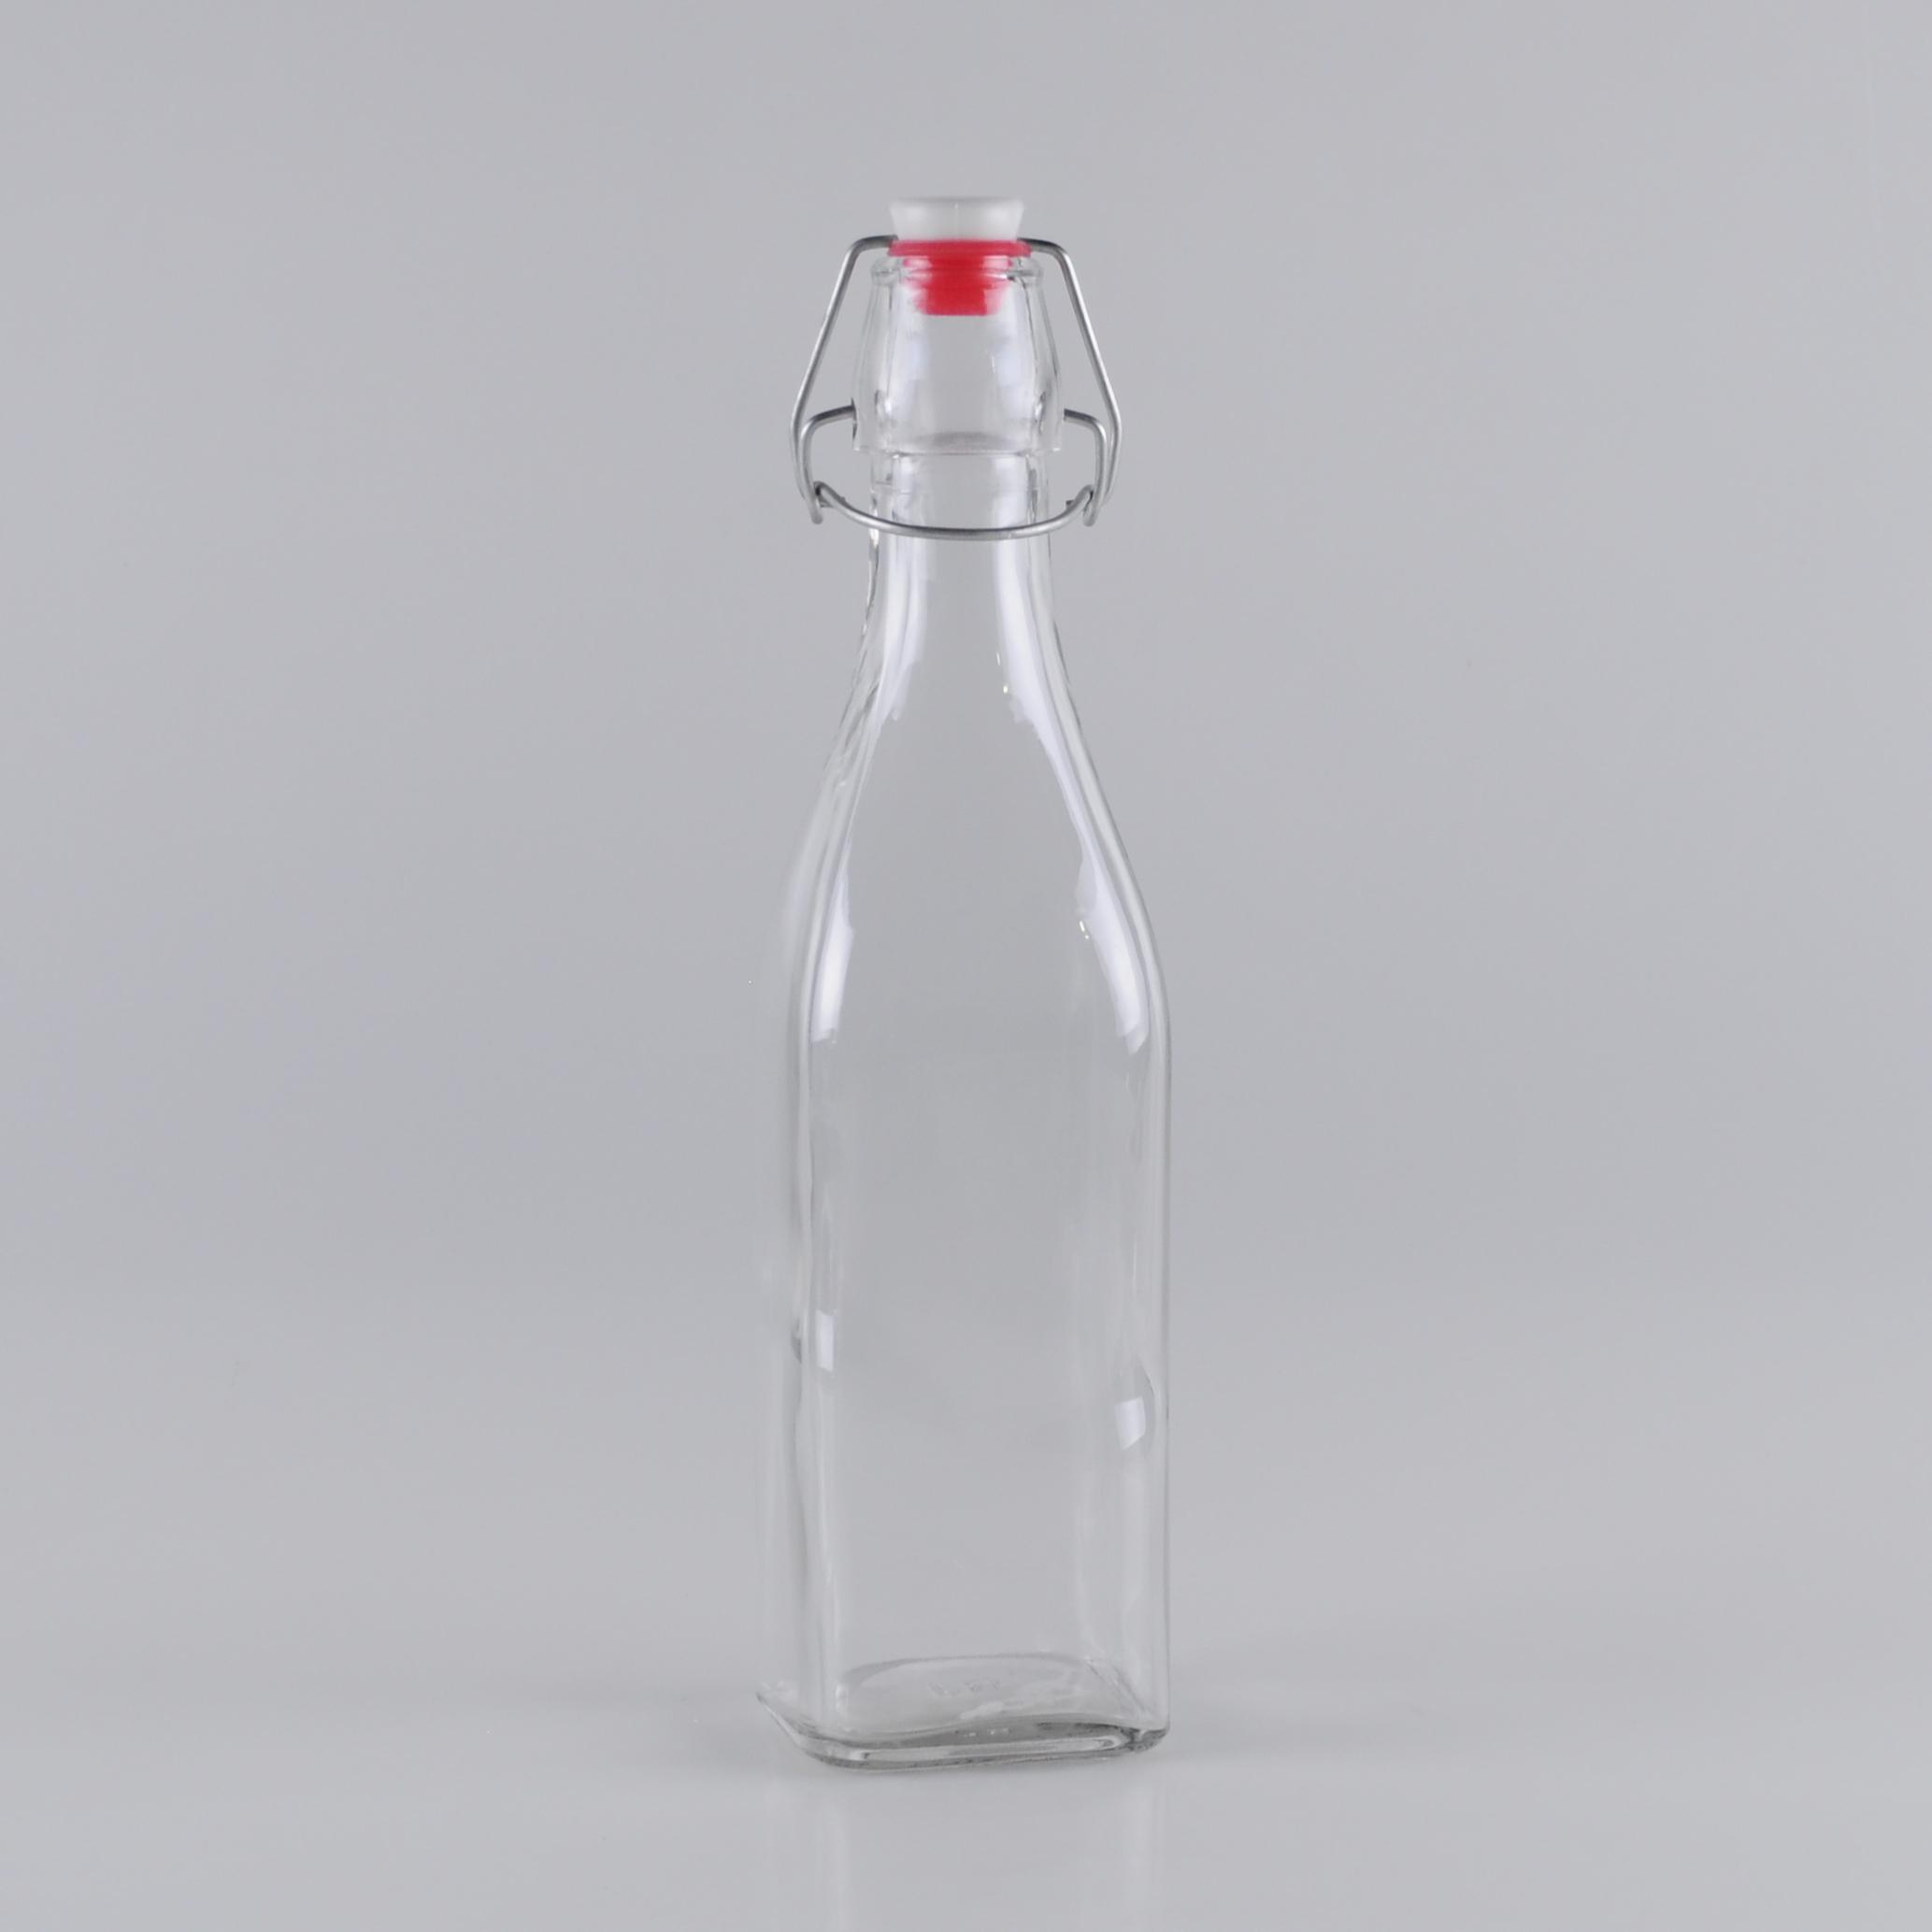 650ml-steel-pop-closure-glass-bottle-for-water (1)